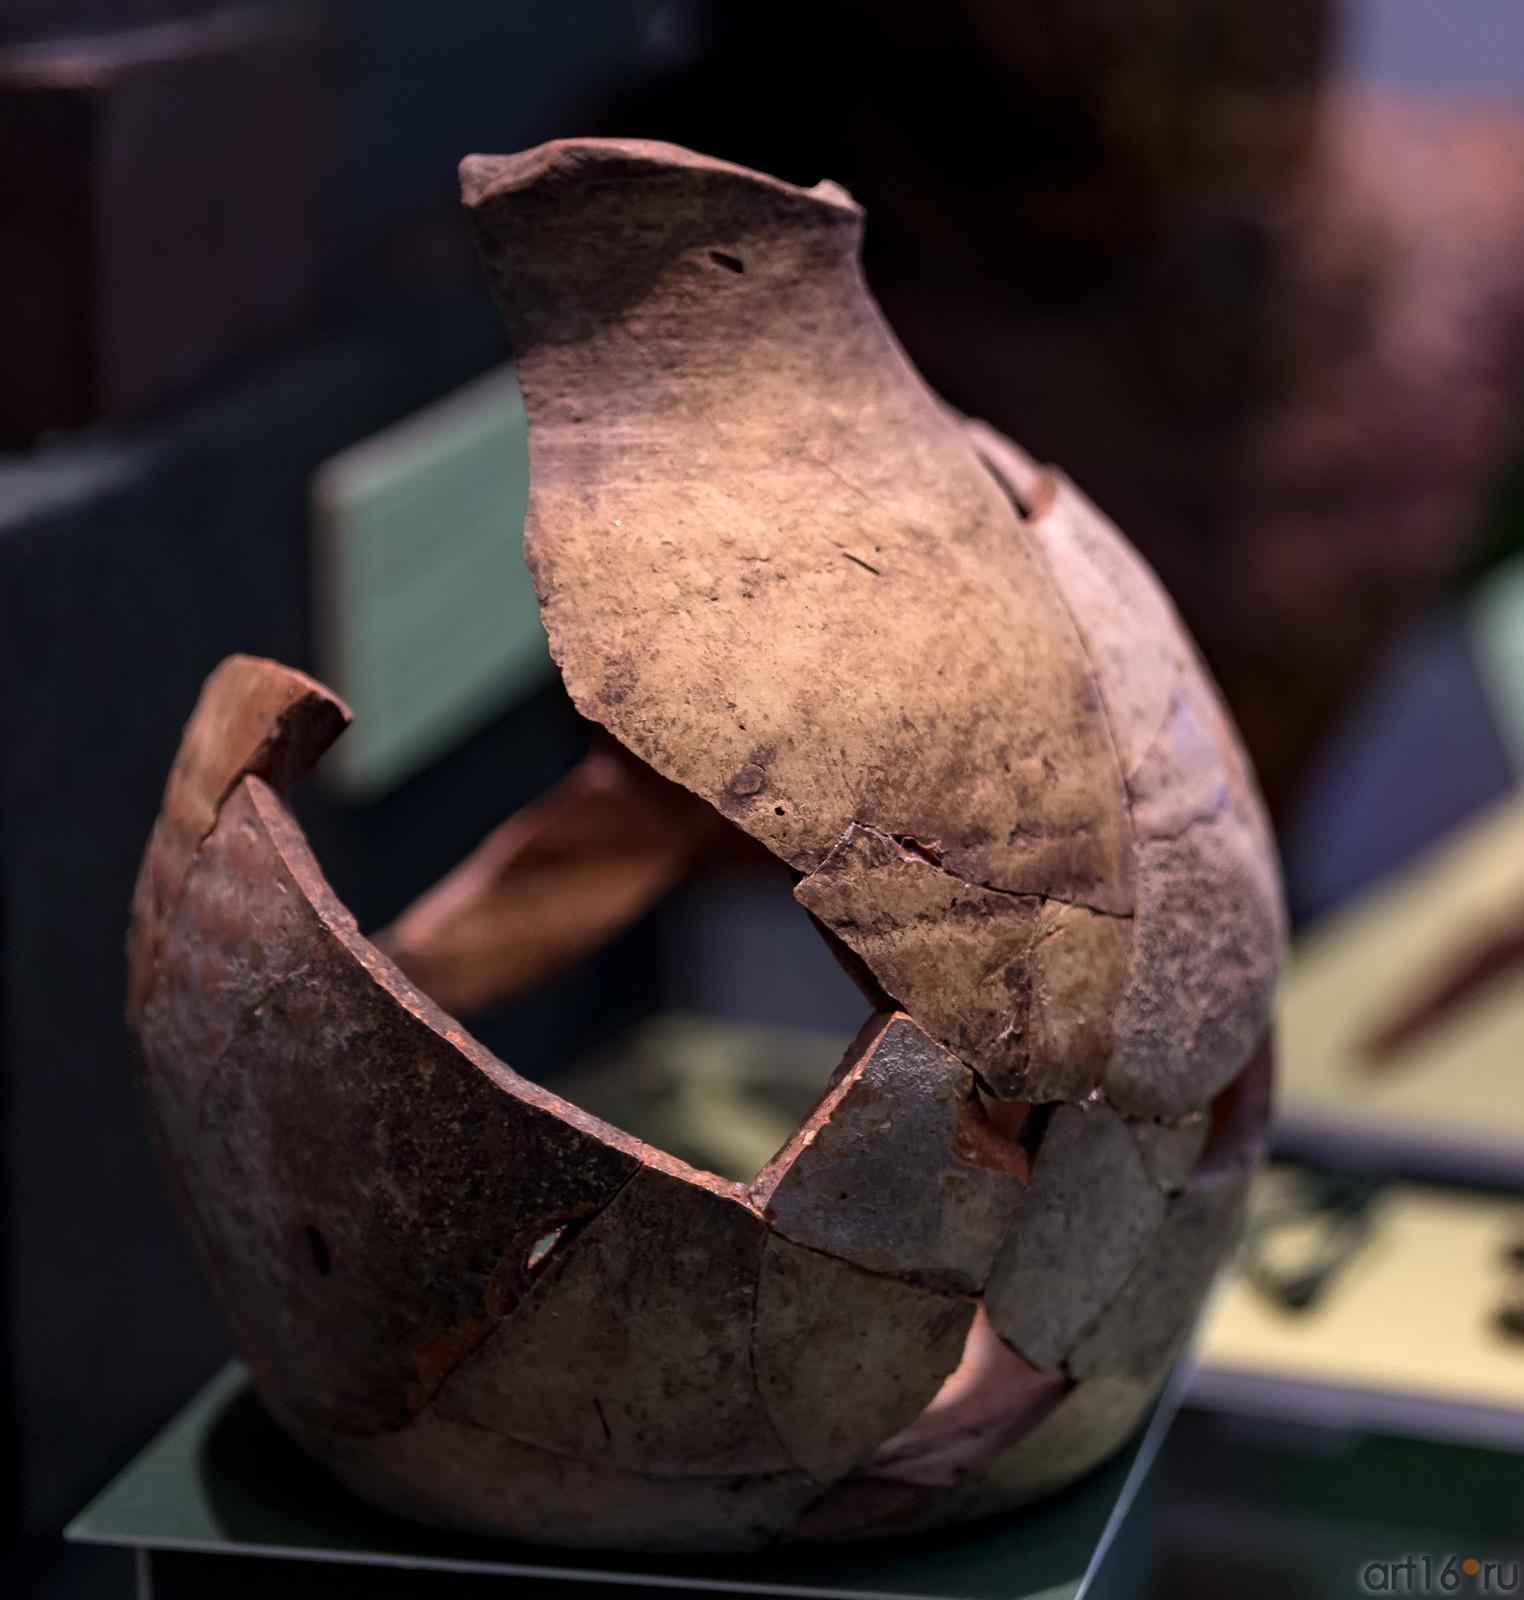 Фото №886451. Глиняный сосуд (III в. н.э.)